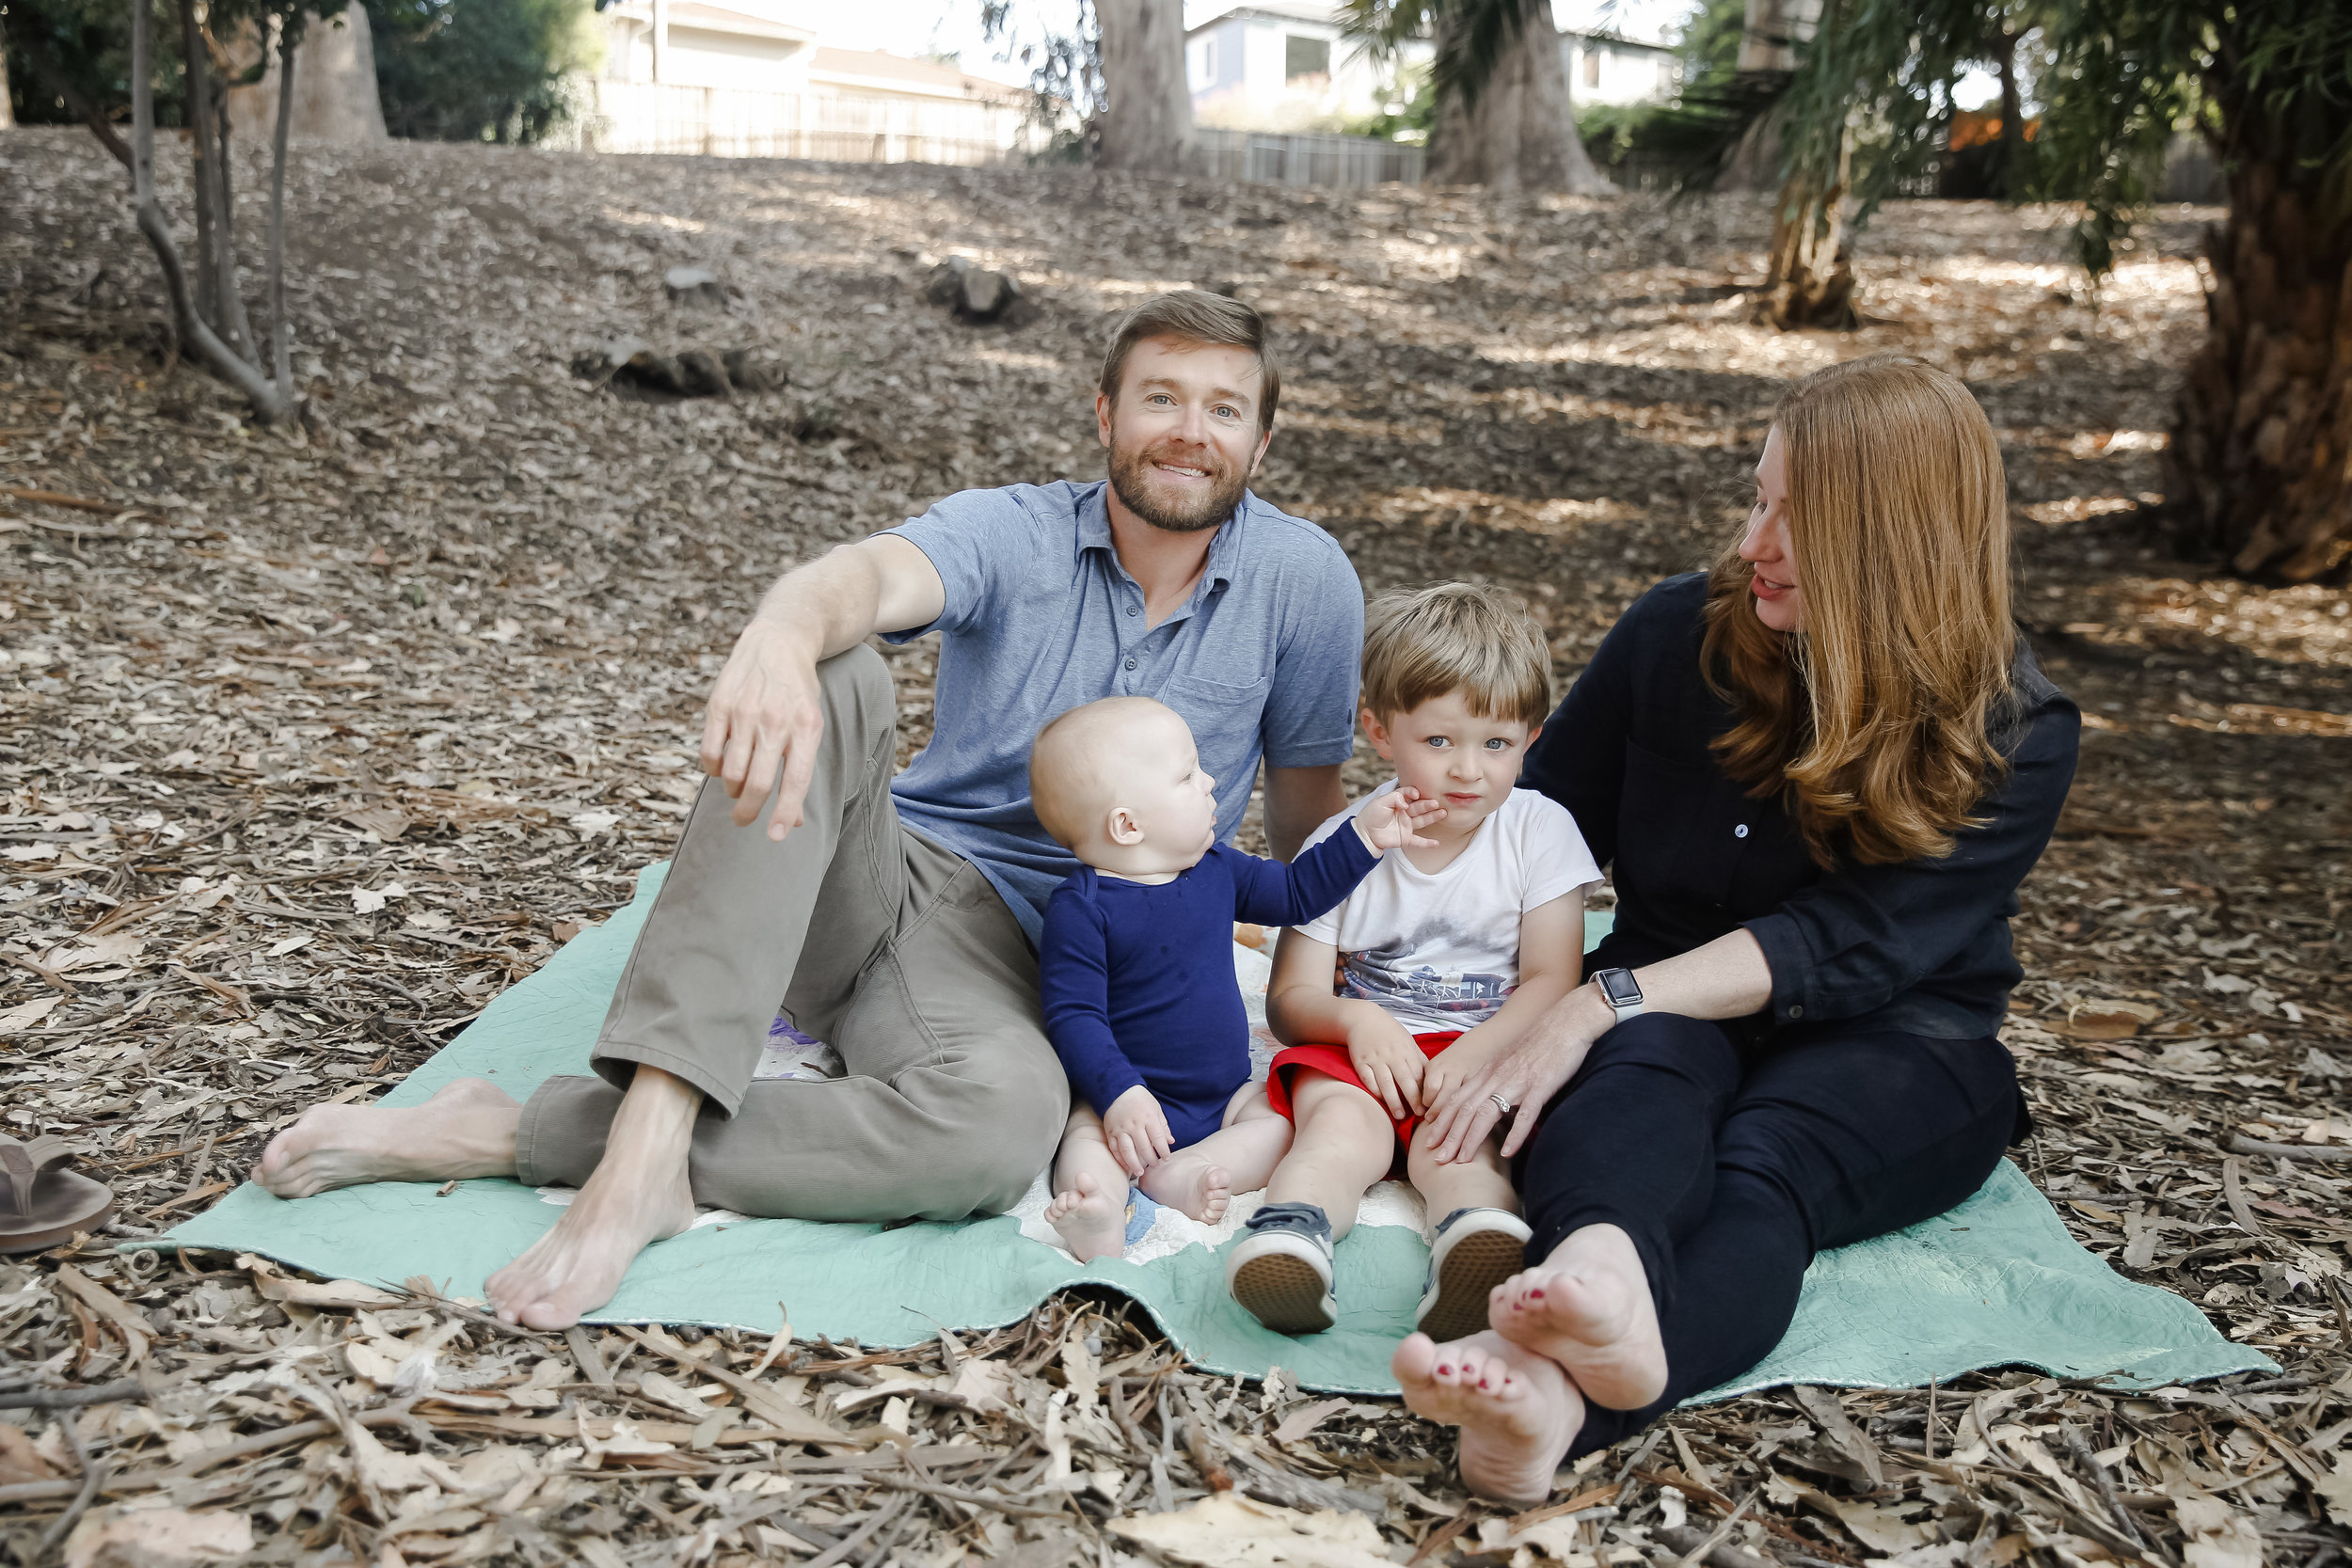 lincolnfamily-ahp-00456.jpg